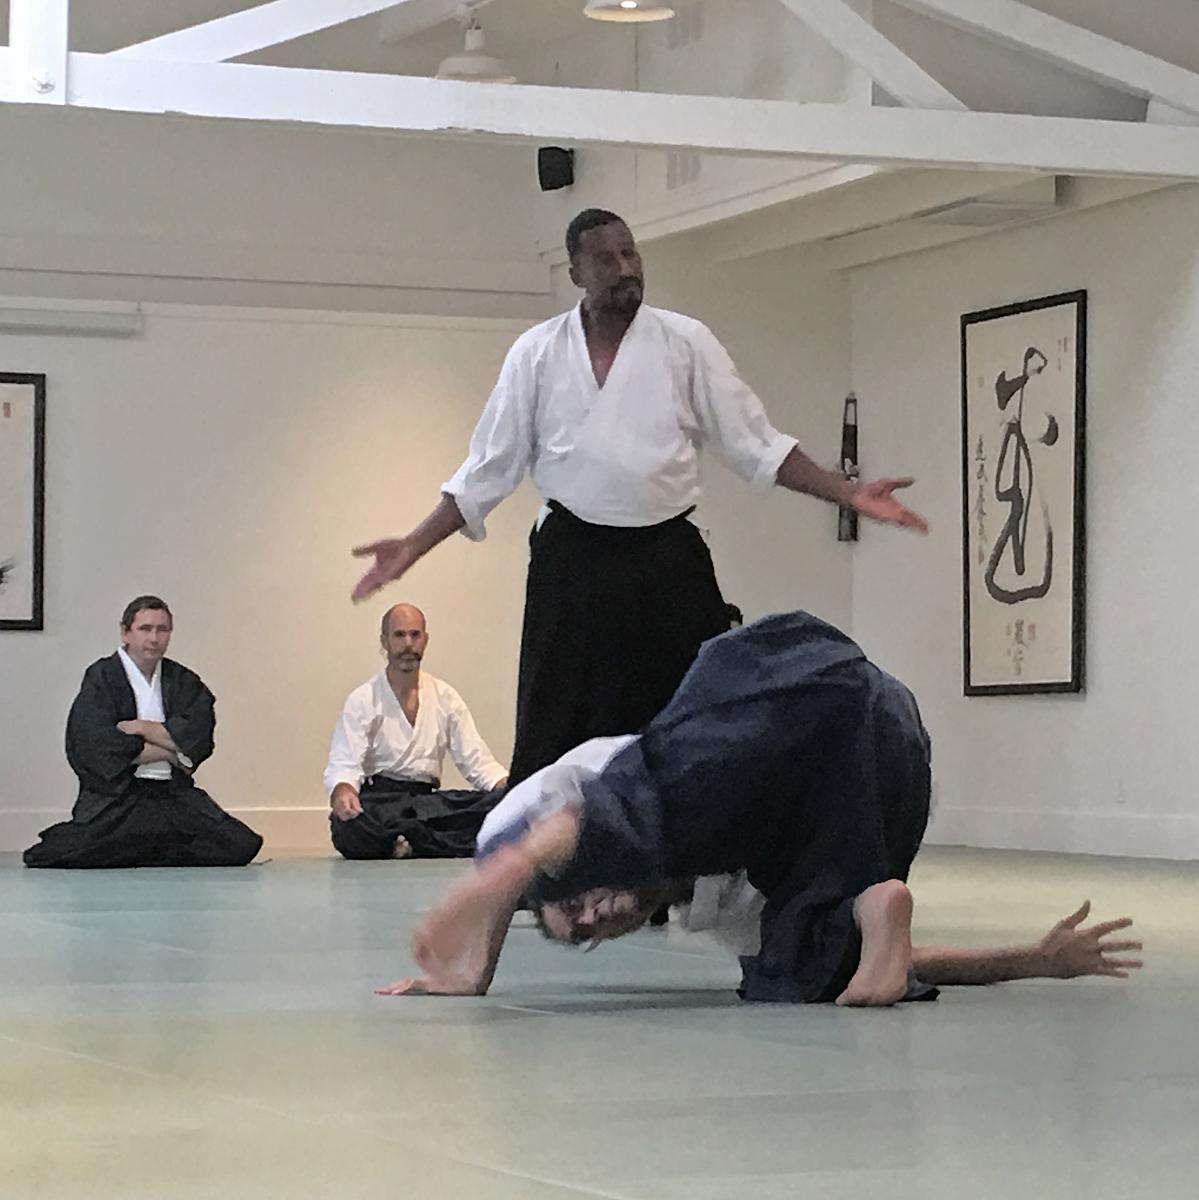 RJ during his Shodan Black Belt Test. The Embodiment of Executive Presence on the mat.